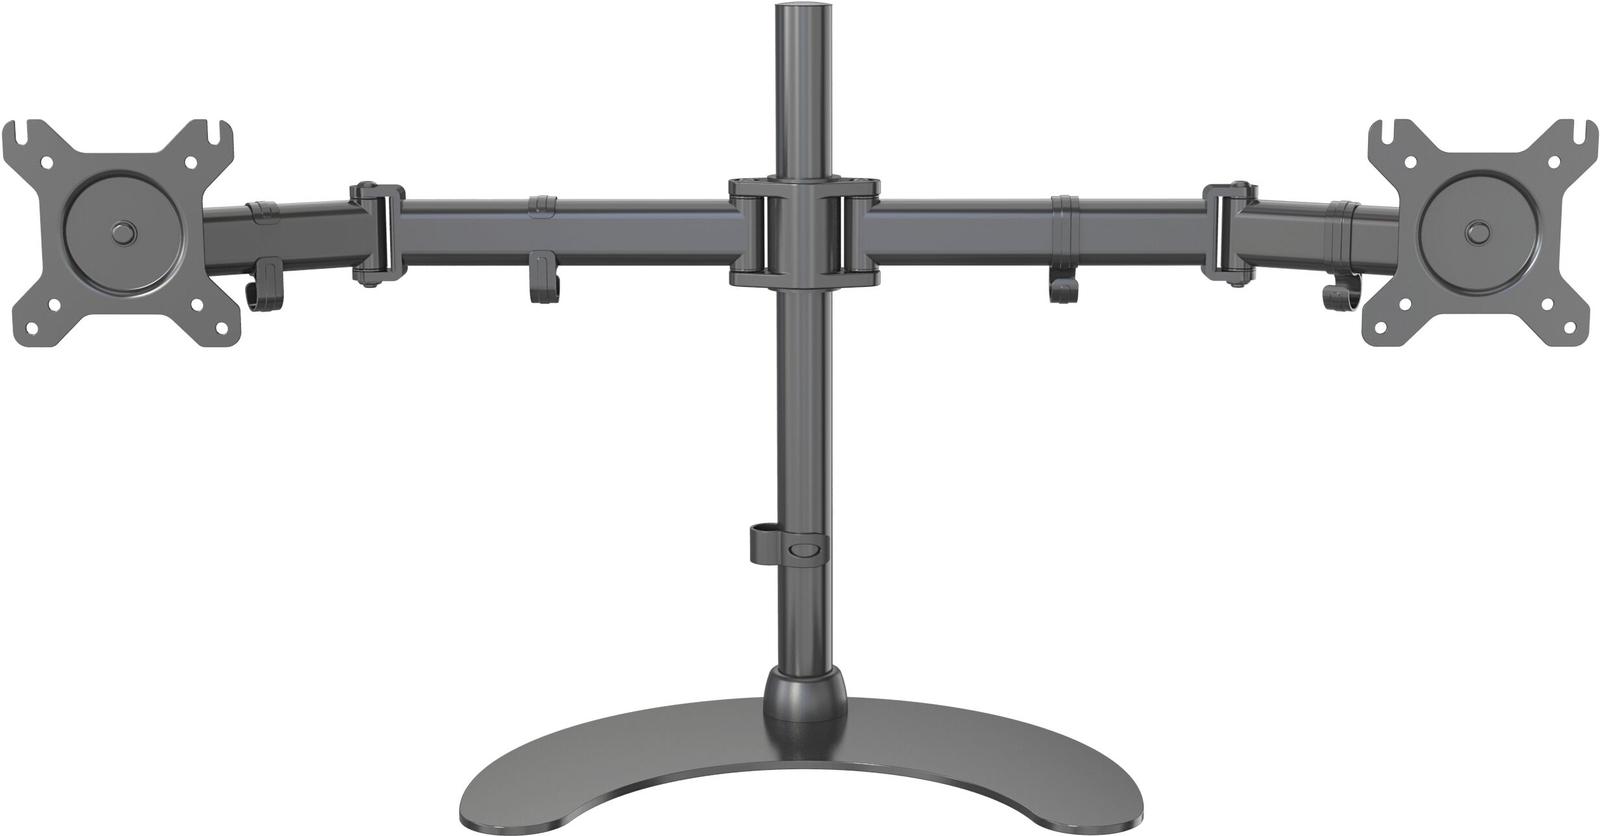 Gorilla Arms Dual Freestanding Monitor Mount image